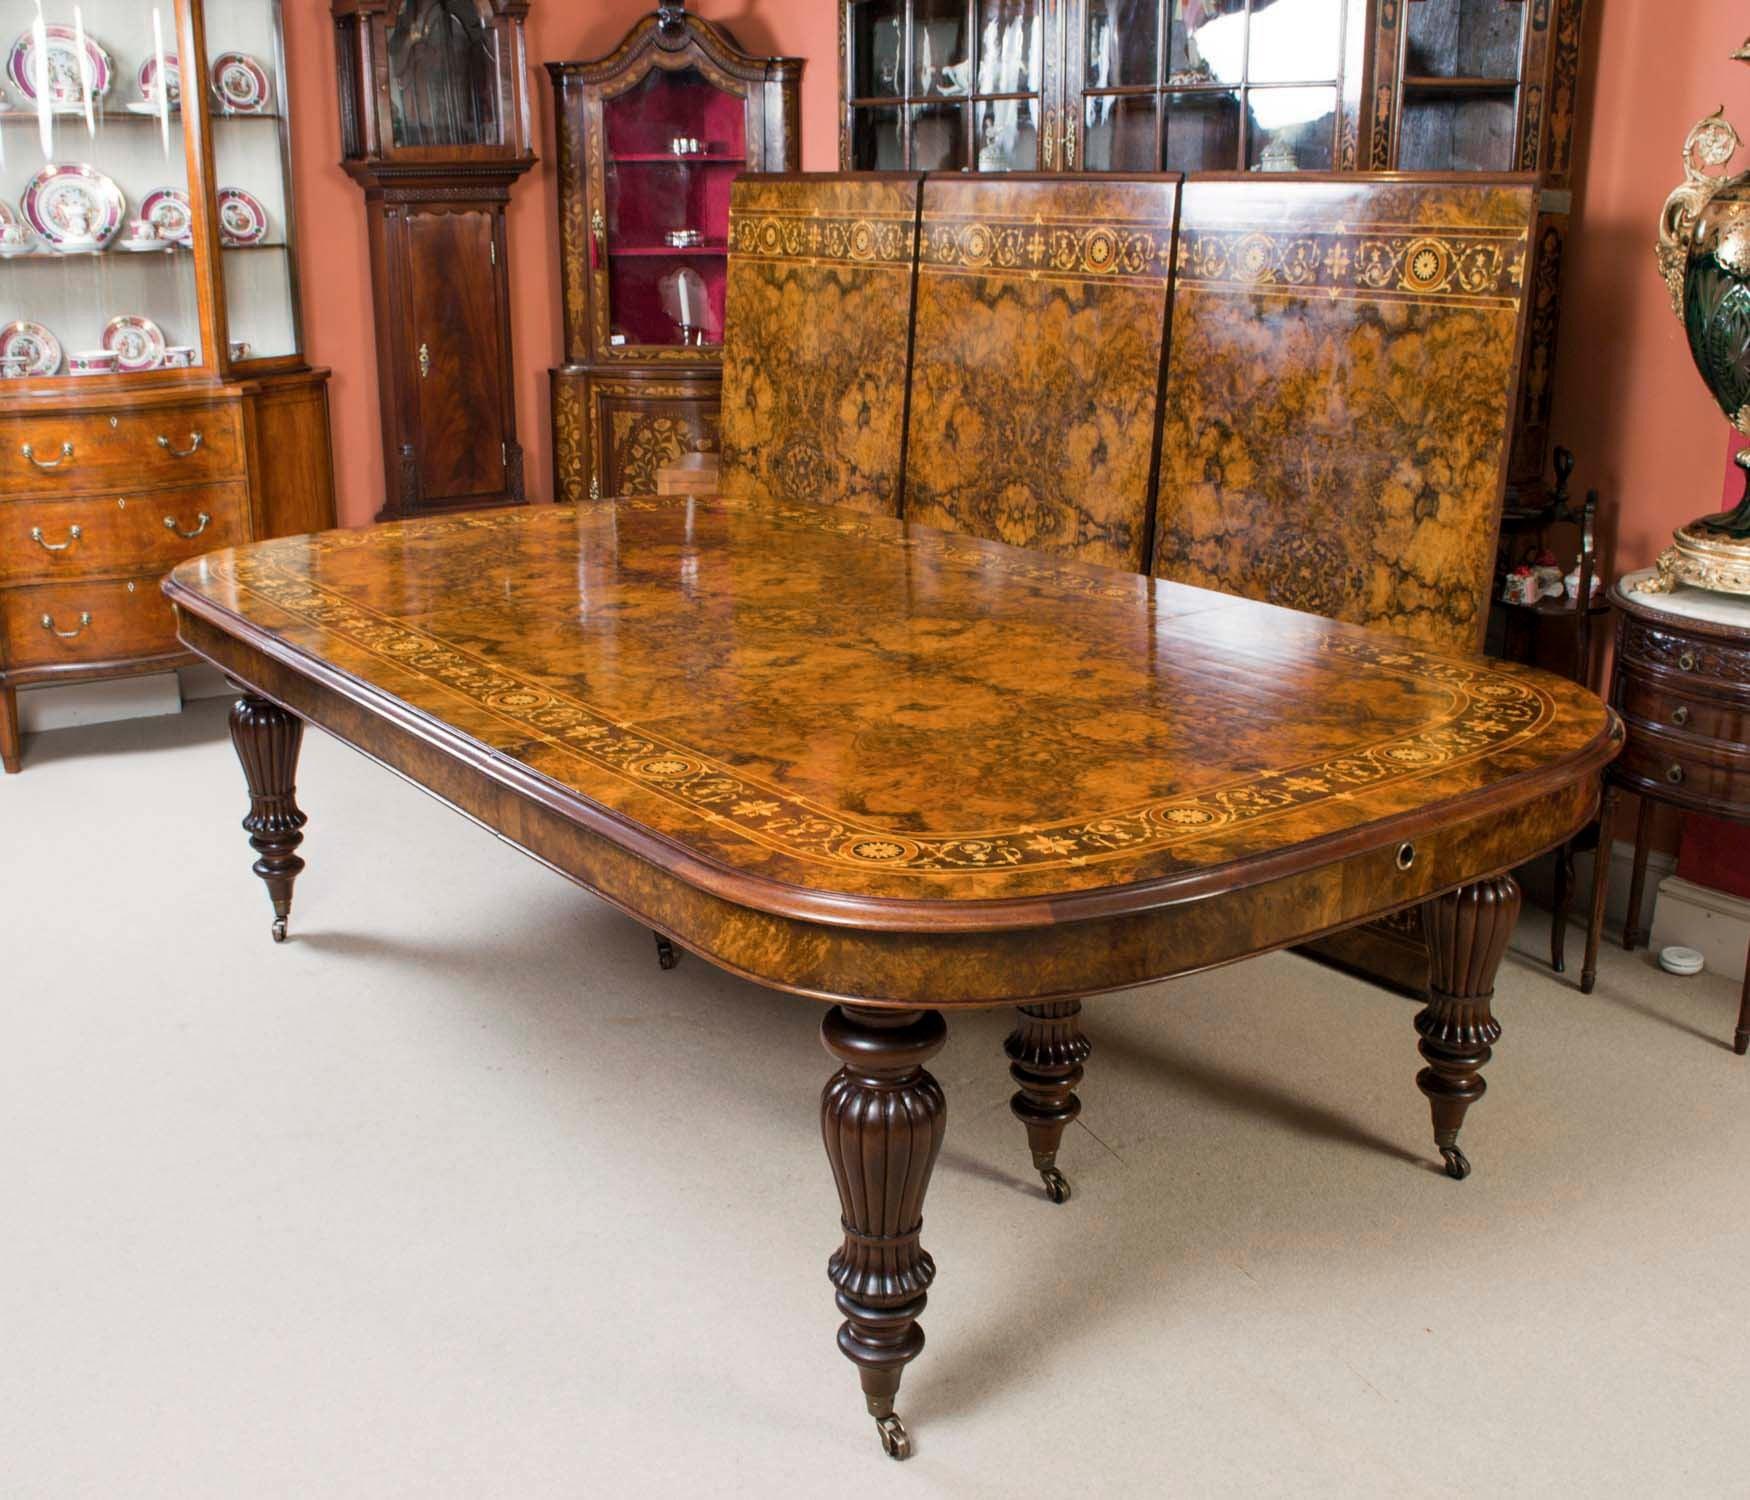 Huge Walnut Table 18 Bespoke Extending Chairs Marquetry Handmade Dining Ok0Xnw8P